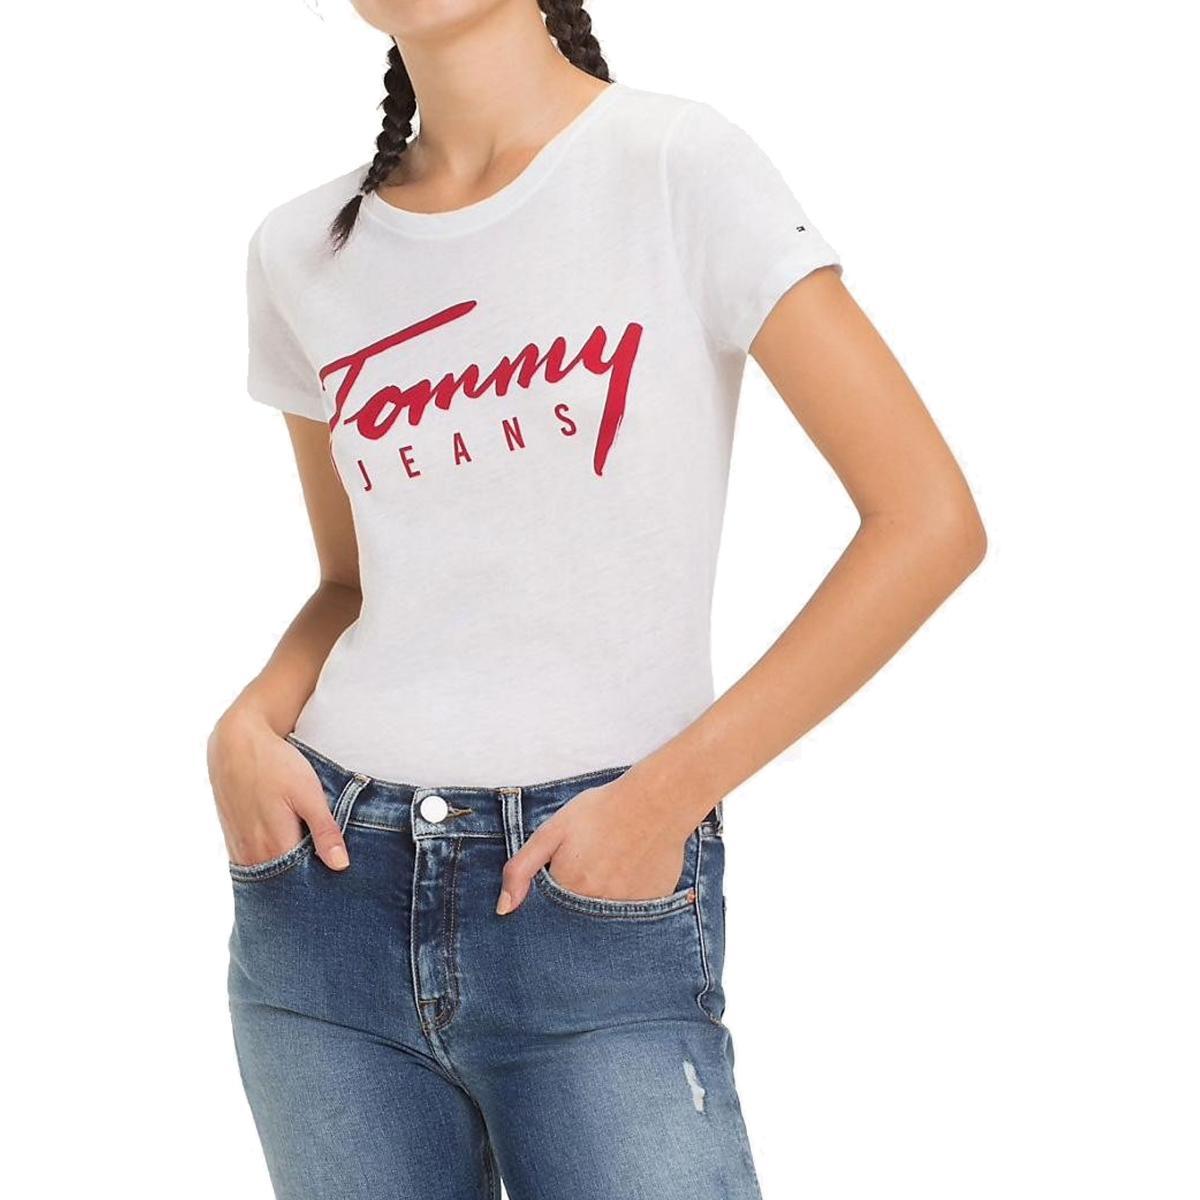 T-shirt Tommy Jeans slim fit con logo da donna rif. DW0DW05700